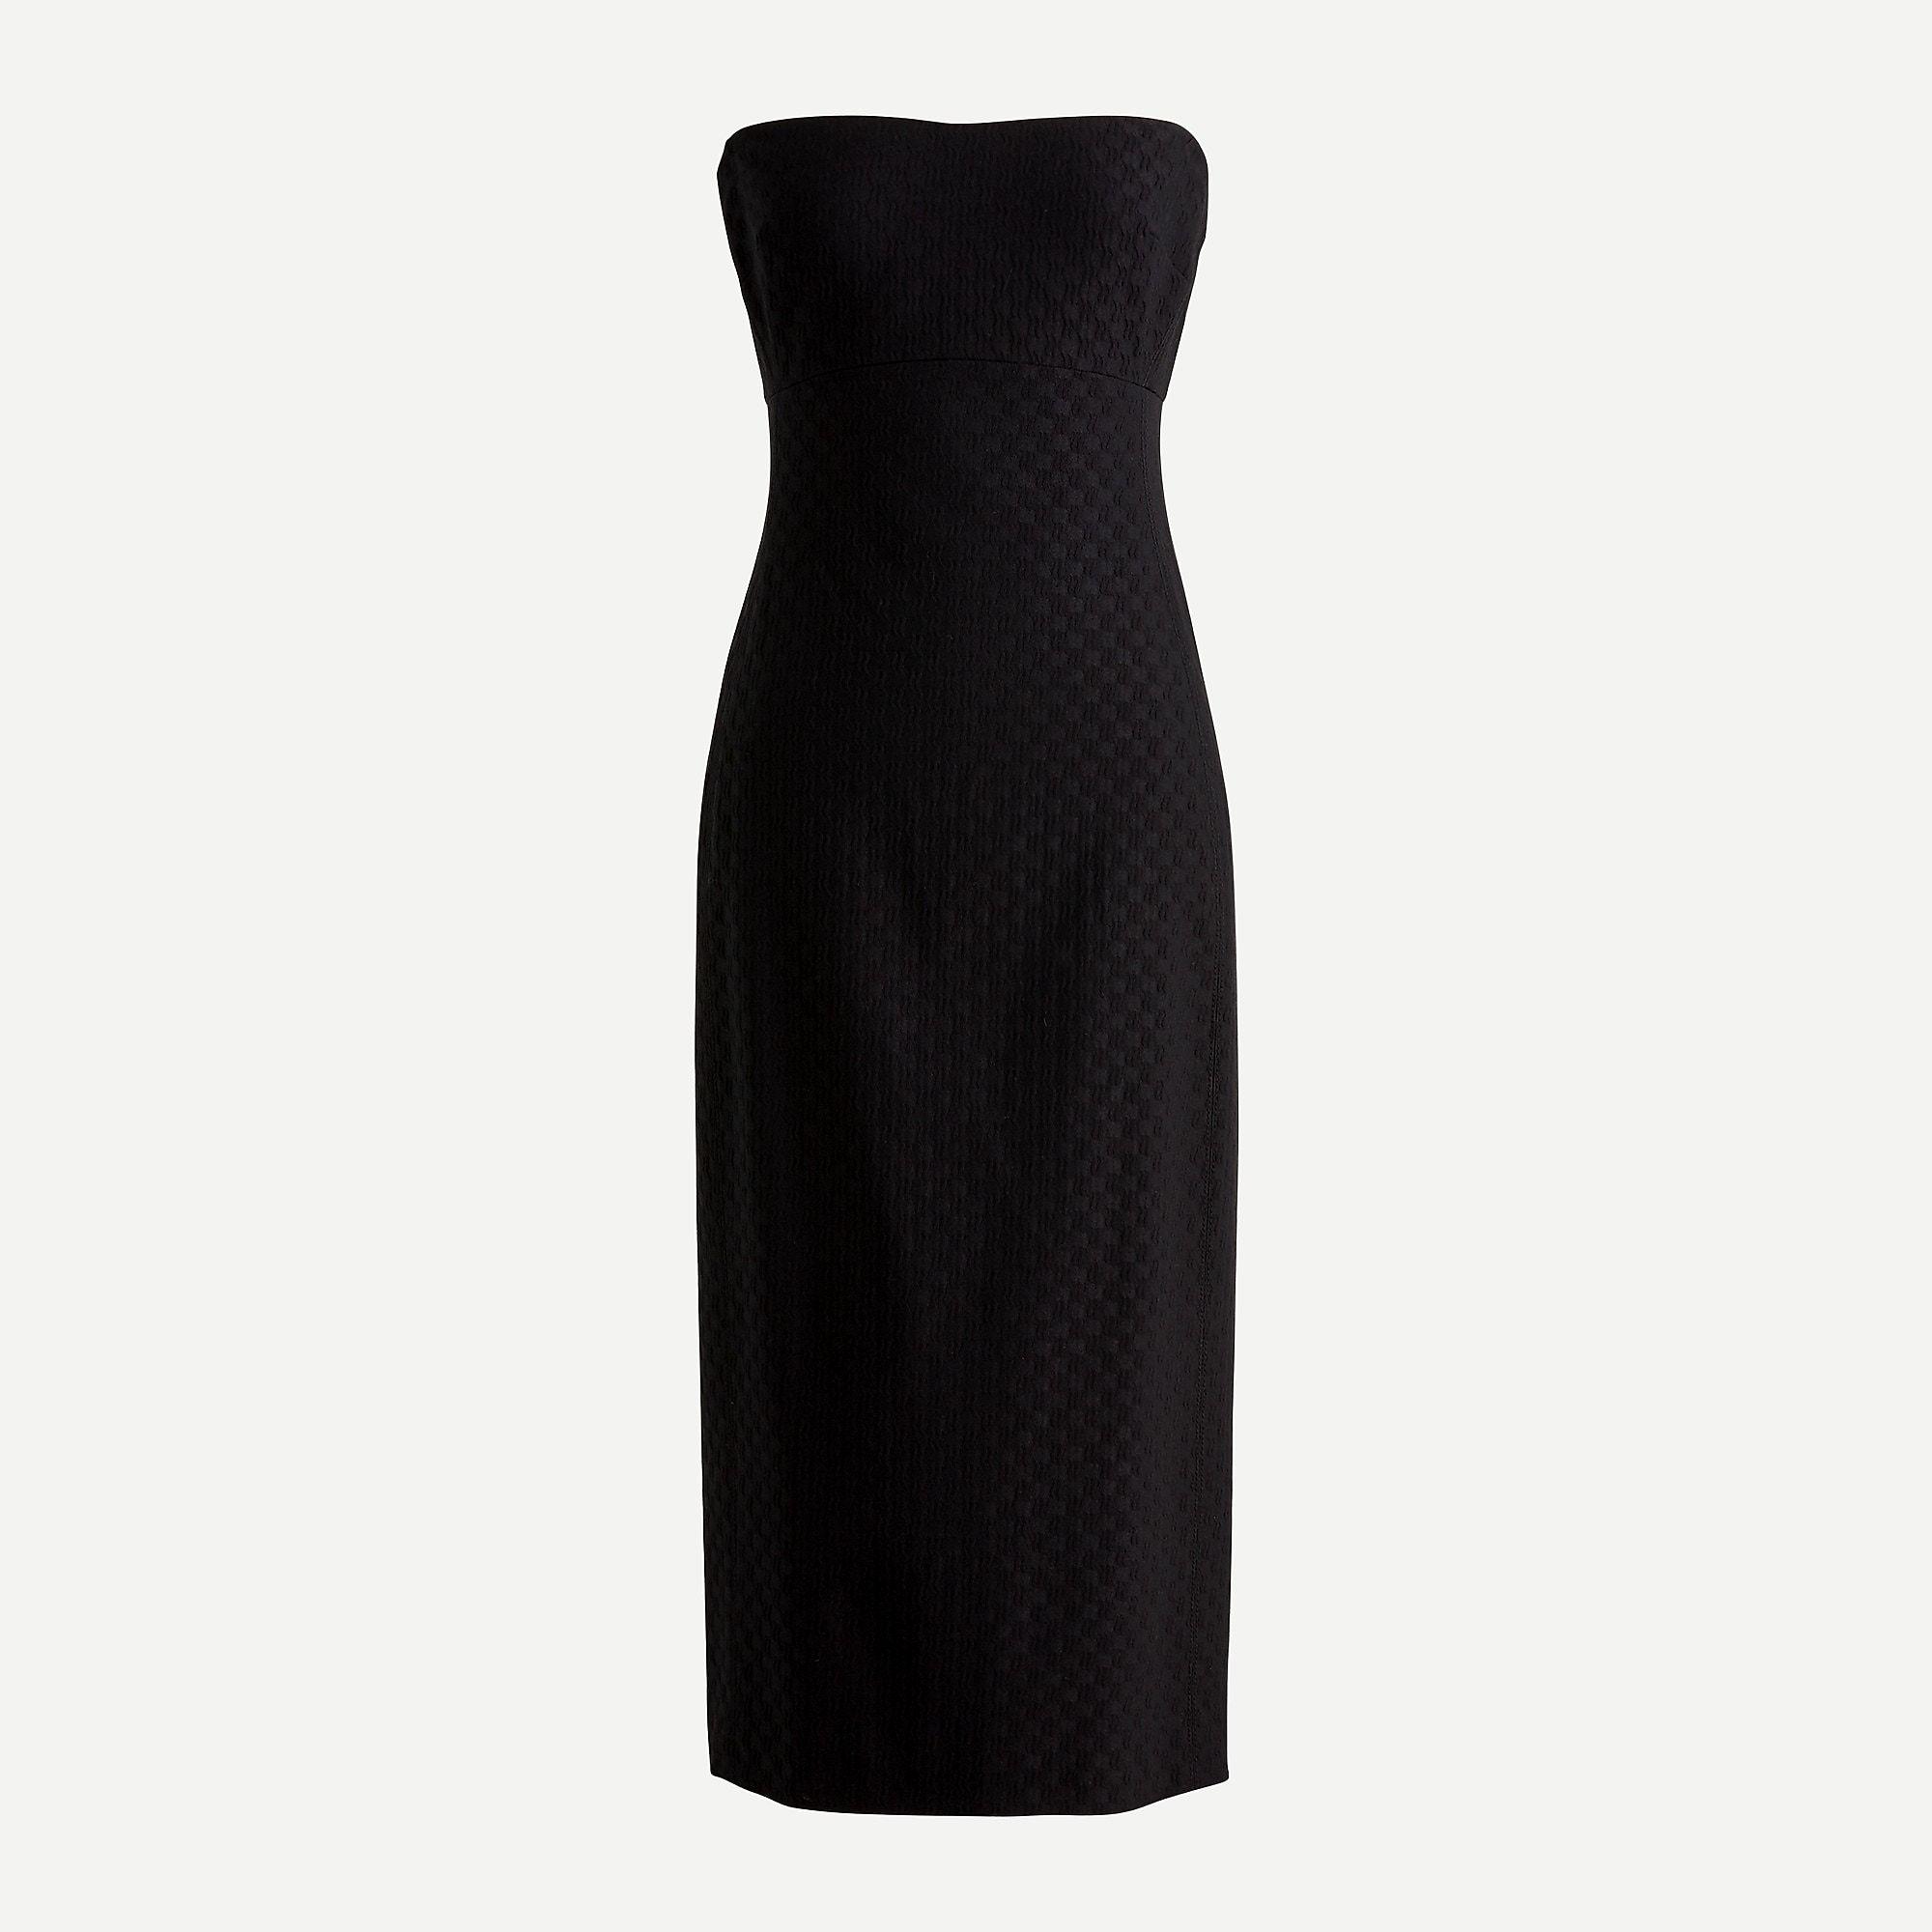 Strapless Dress In Stretch Matelasse Dresses Strapless Dress Black Strapless Dress [ 2000 x 2000 Pixel ]